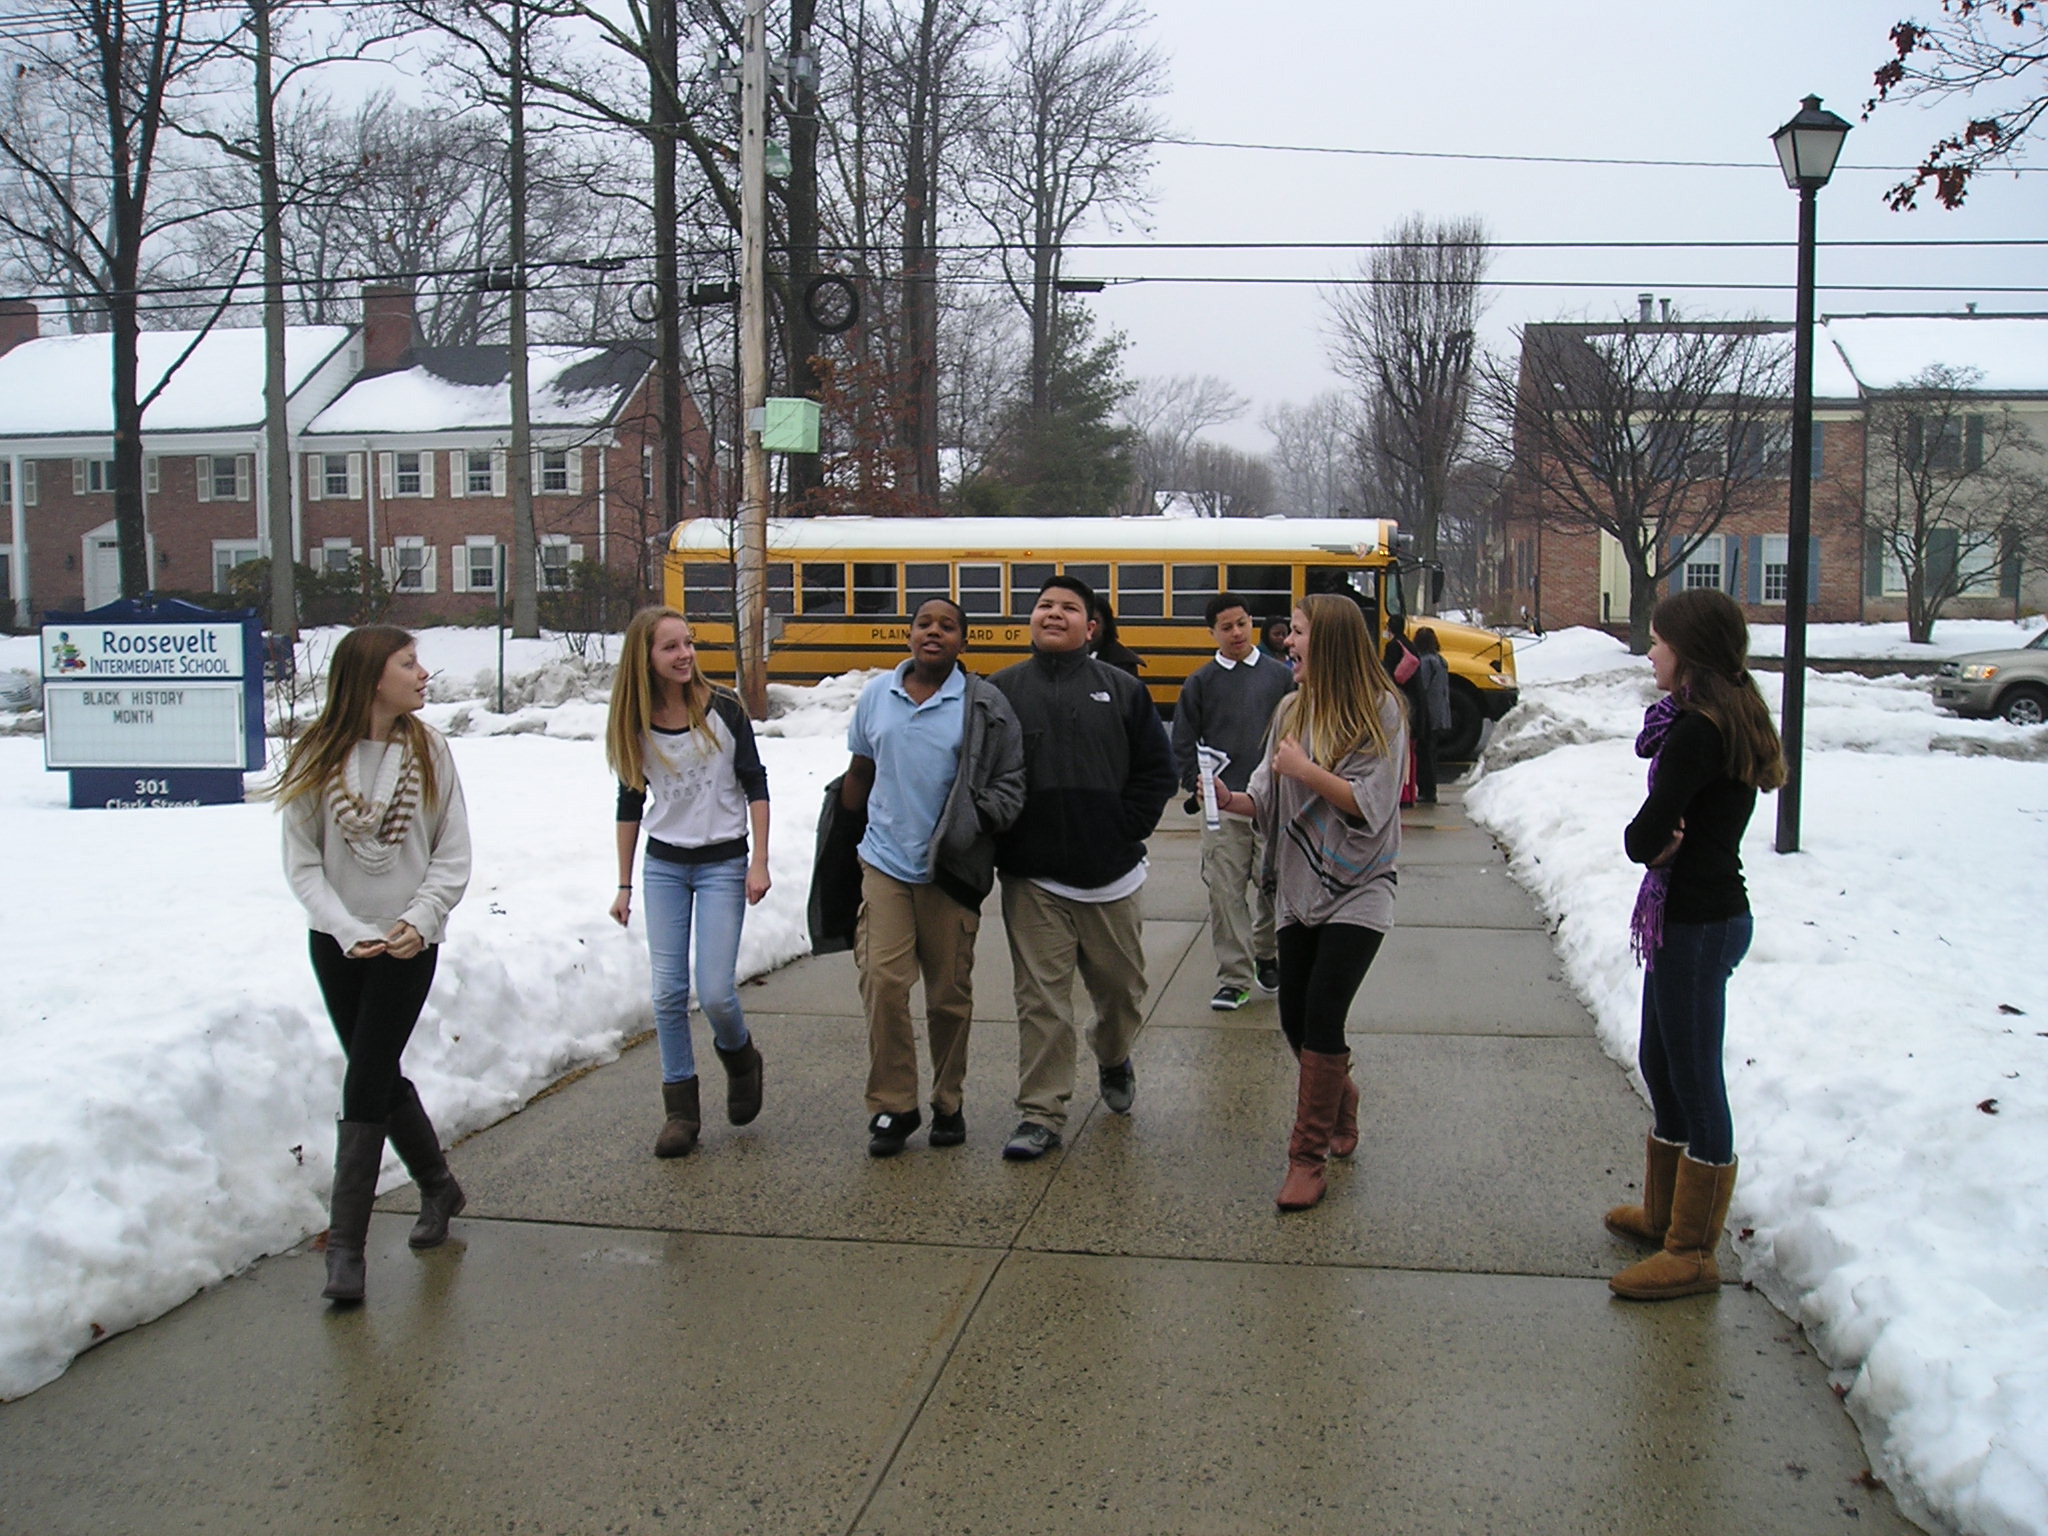 fd3da56c7b83c691e30b_Plainfield_students_welcomed_by_RIS_8th_graders.JPG